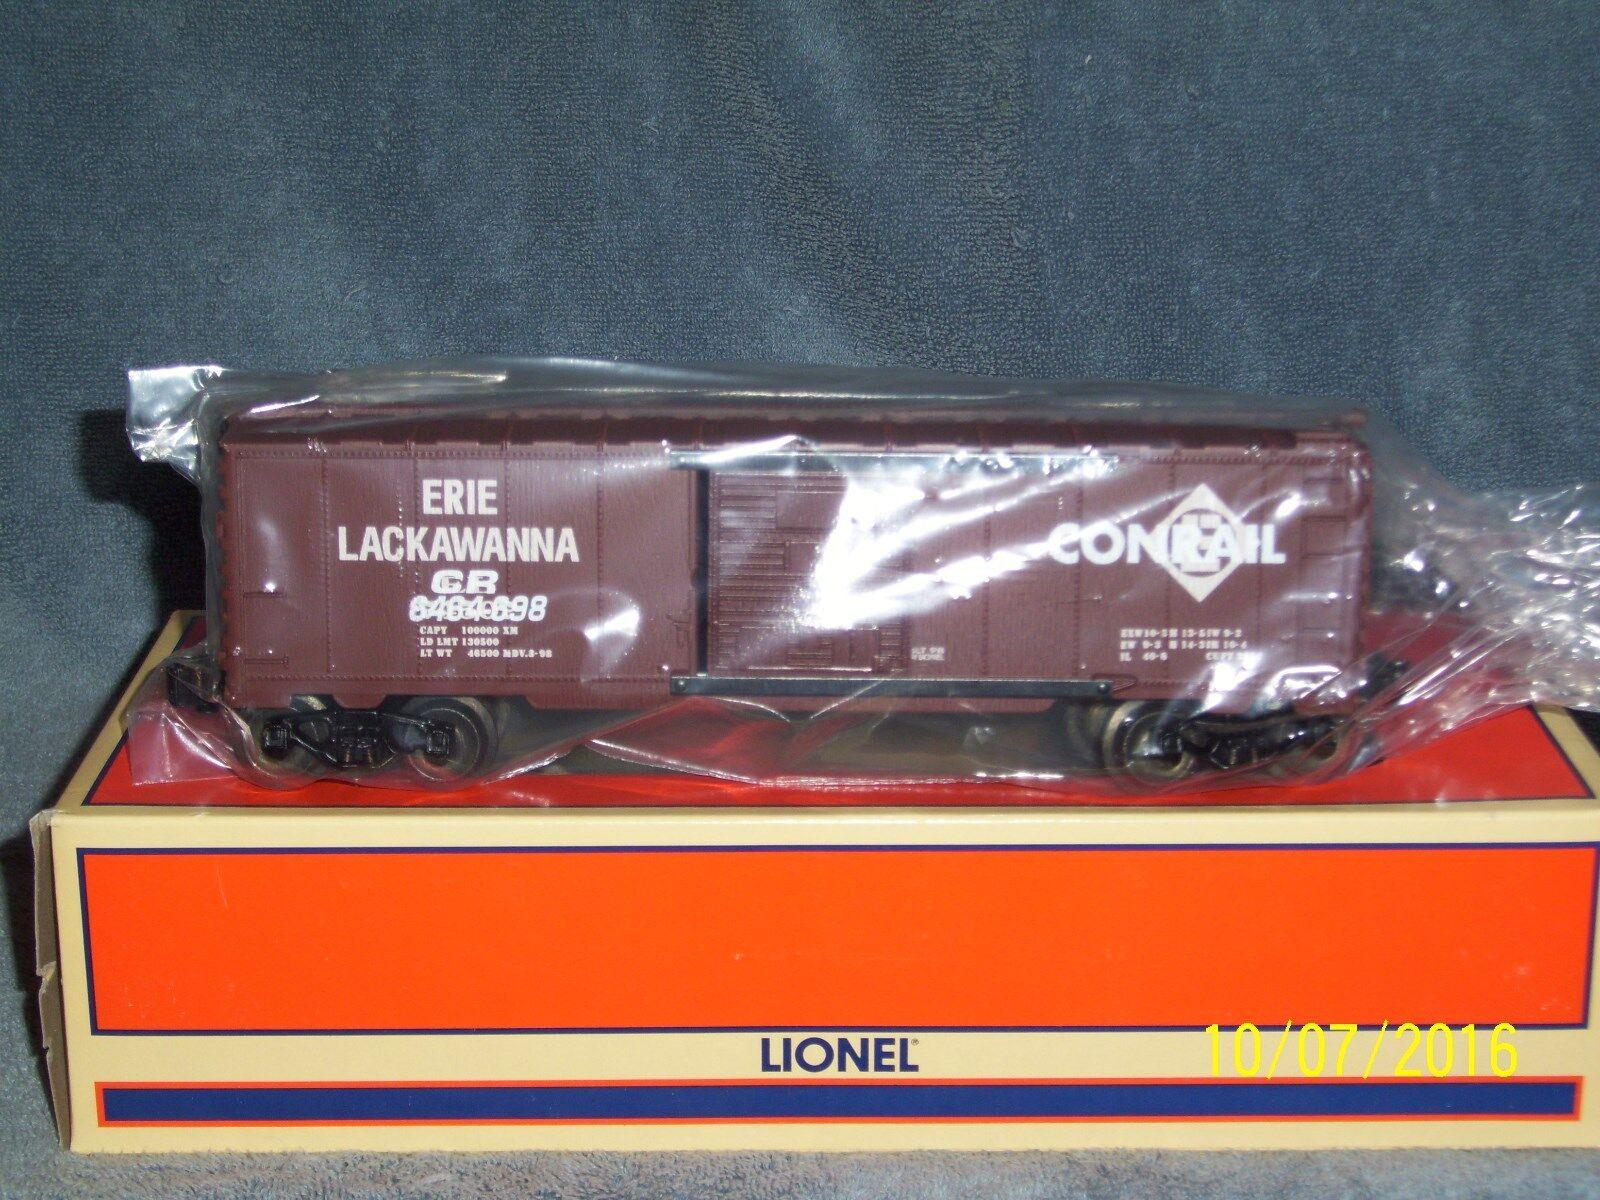 LIONEL 629234 ERIE LACKAWANNA CONRAIL OVERSTAMPED 6464 scatolaauto